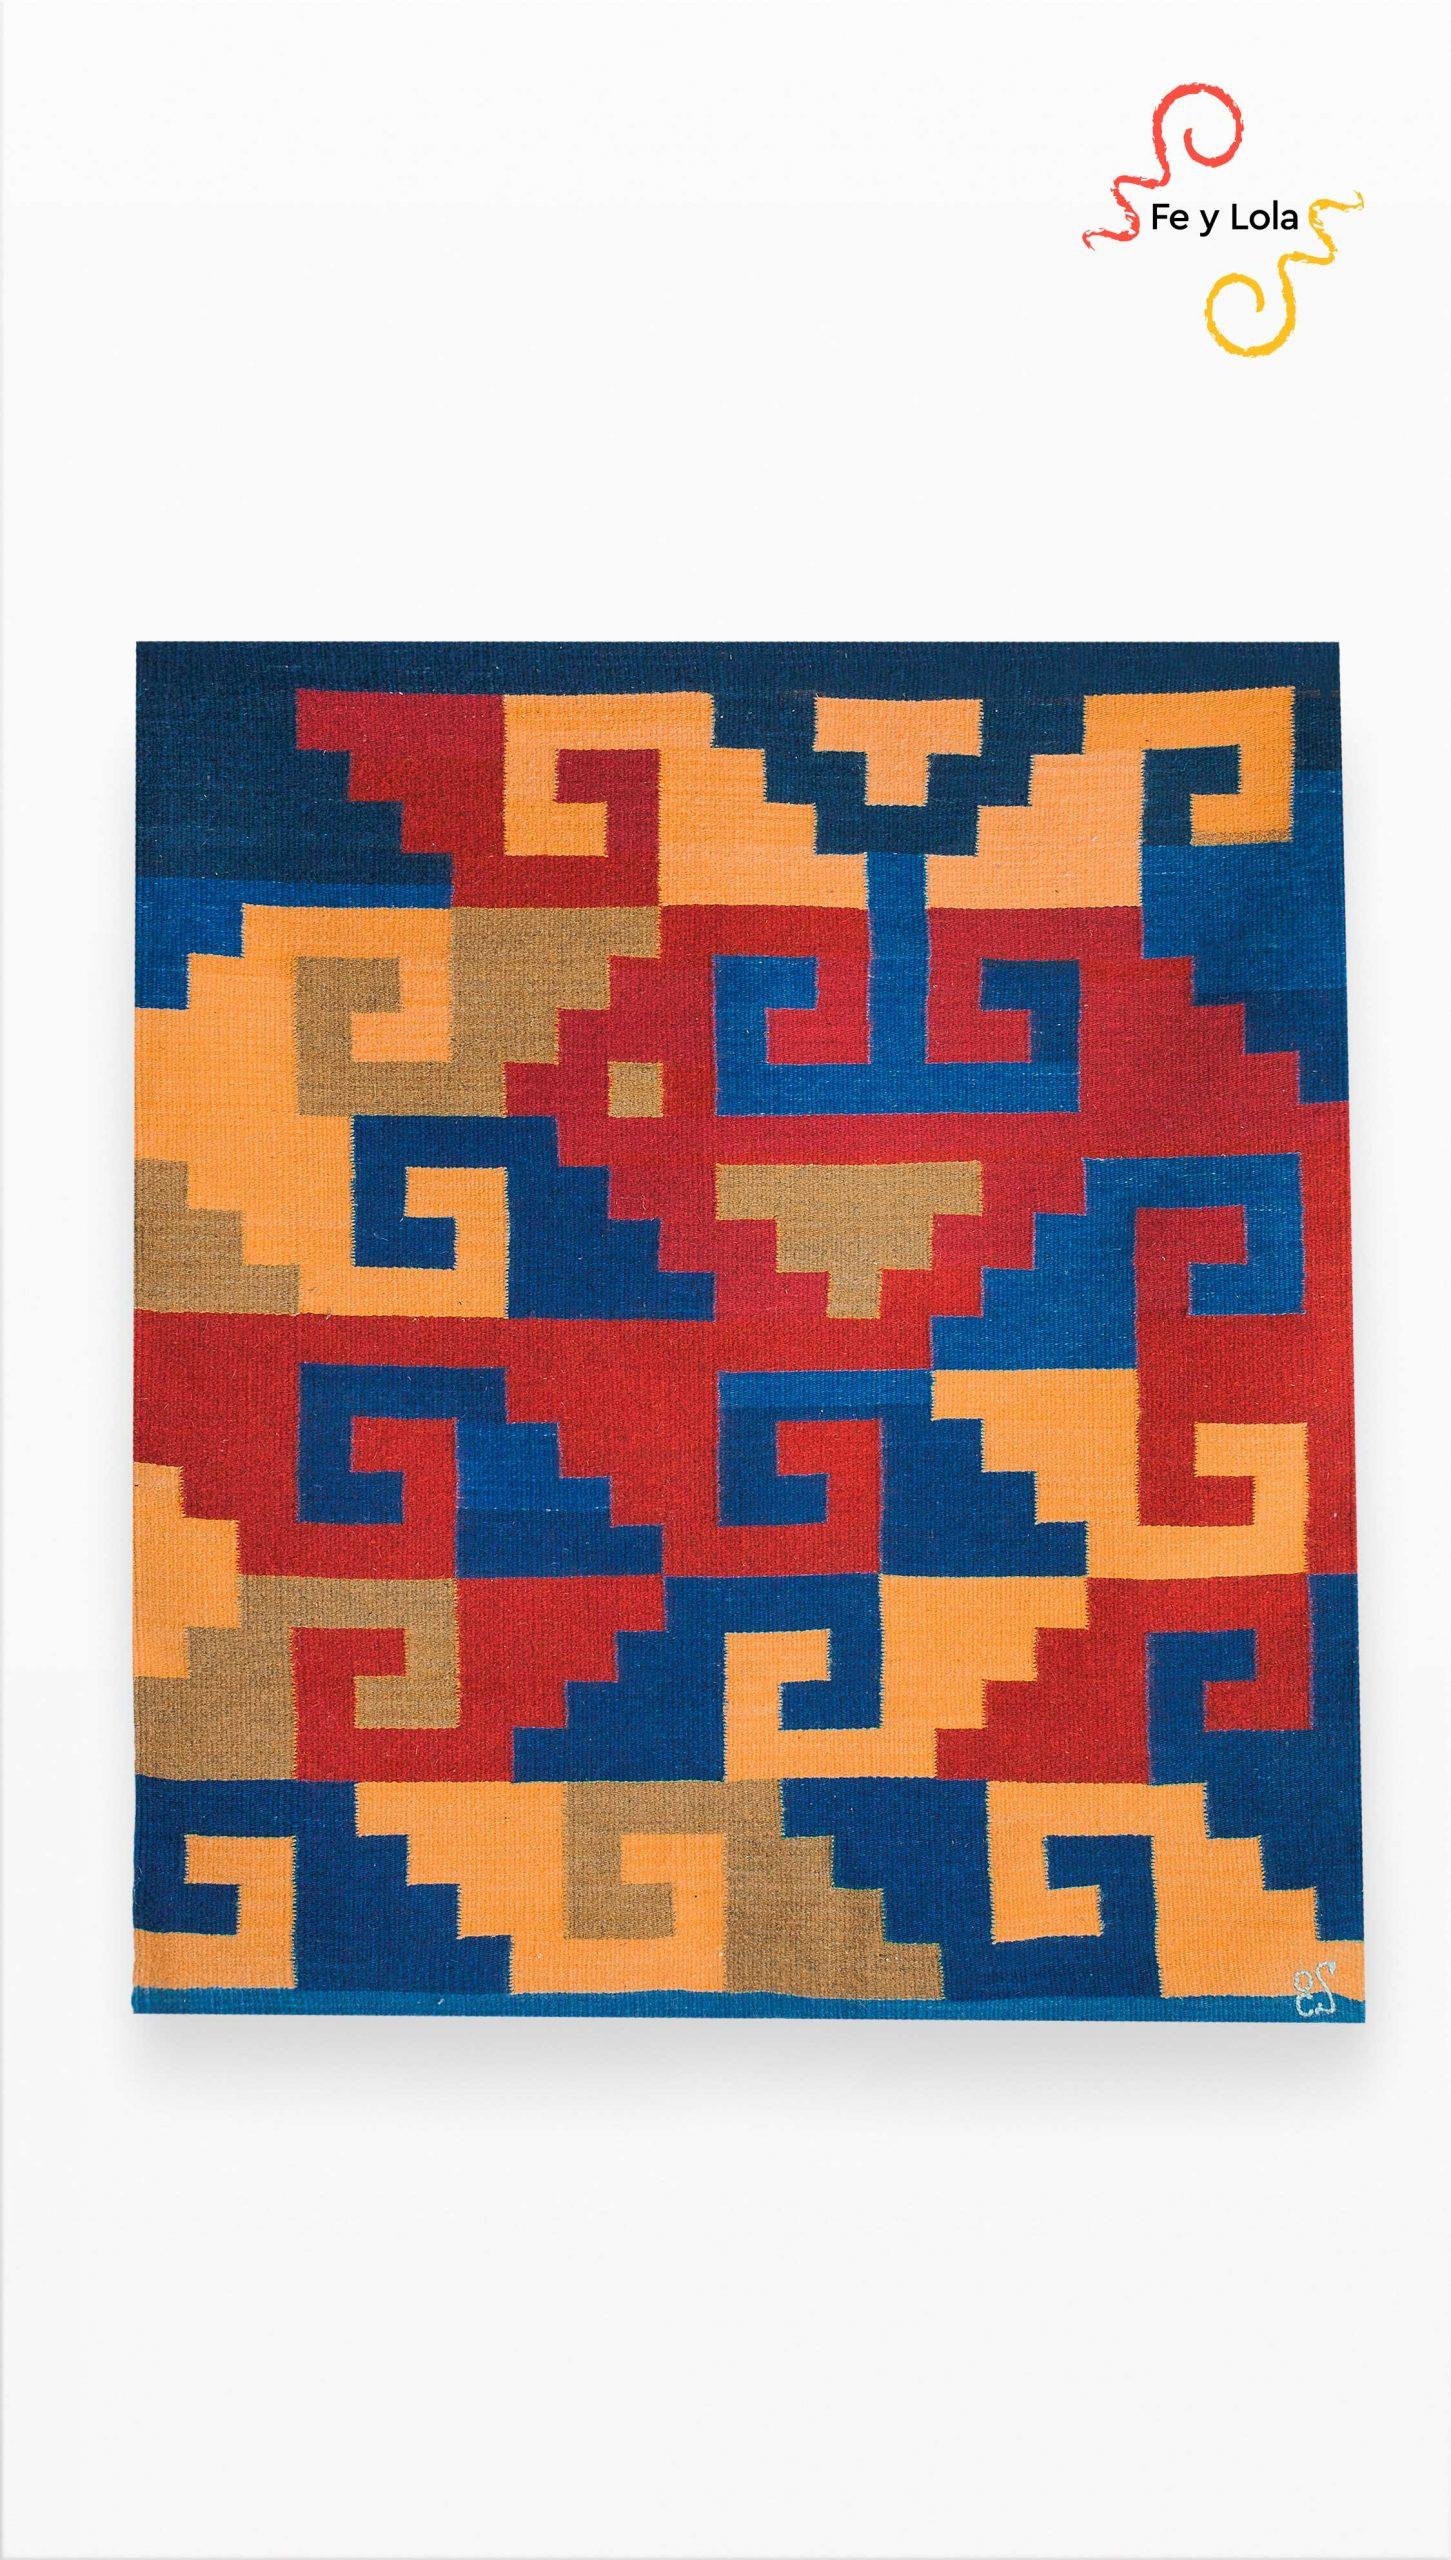 Oaxaca rugs. Feylola. Made in oaxaca. Tapetes de Teotitlán